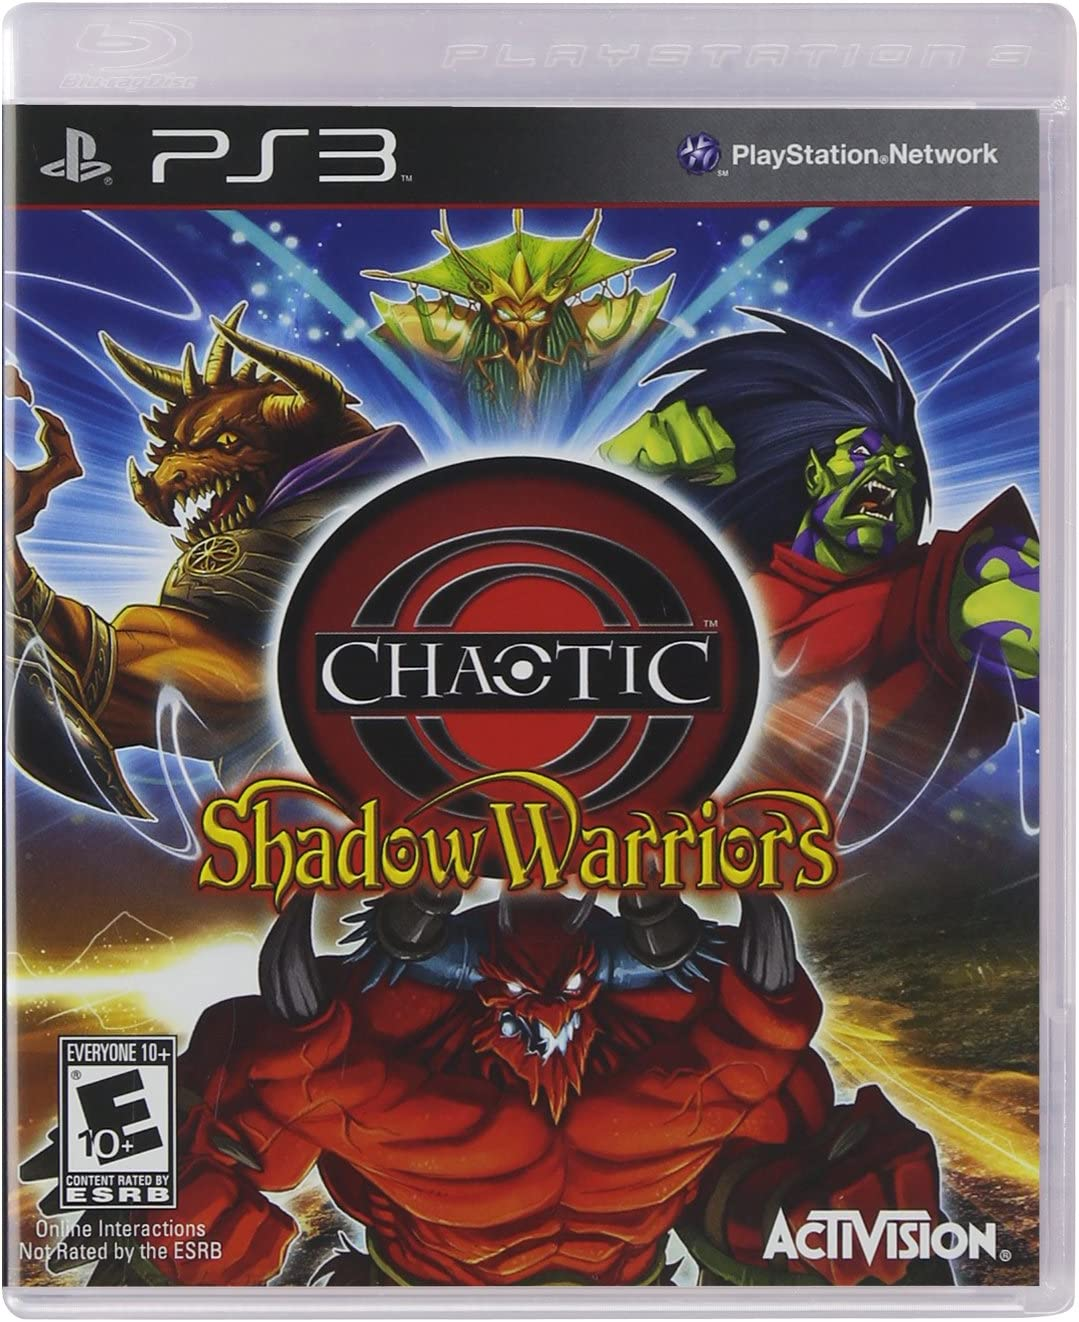 Amazon.com: Chaotic: Shadow Warriors - Playstation 3: Video ...